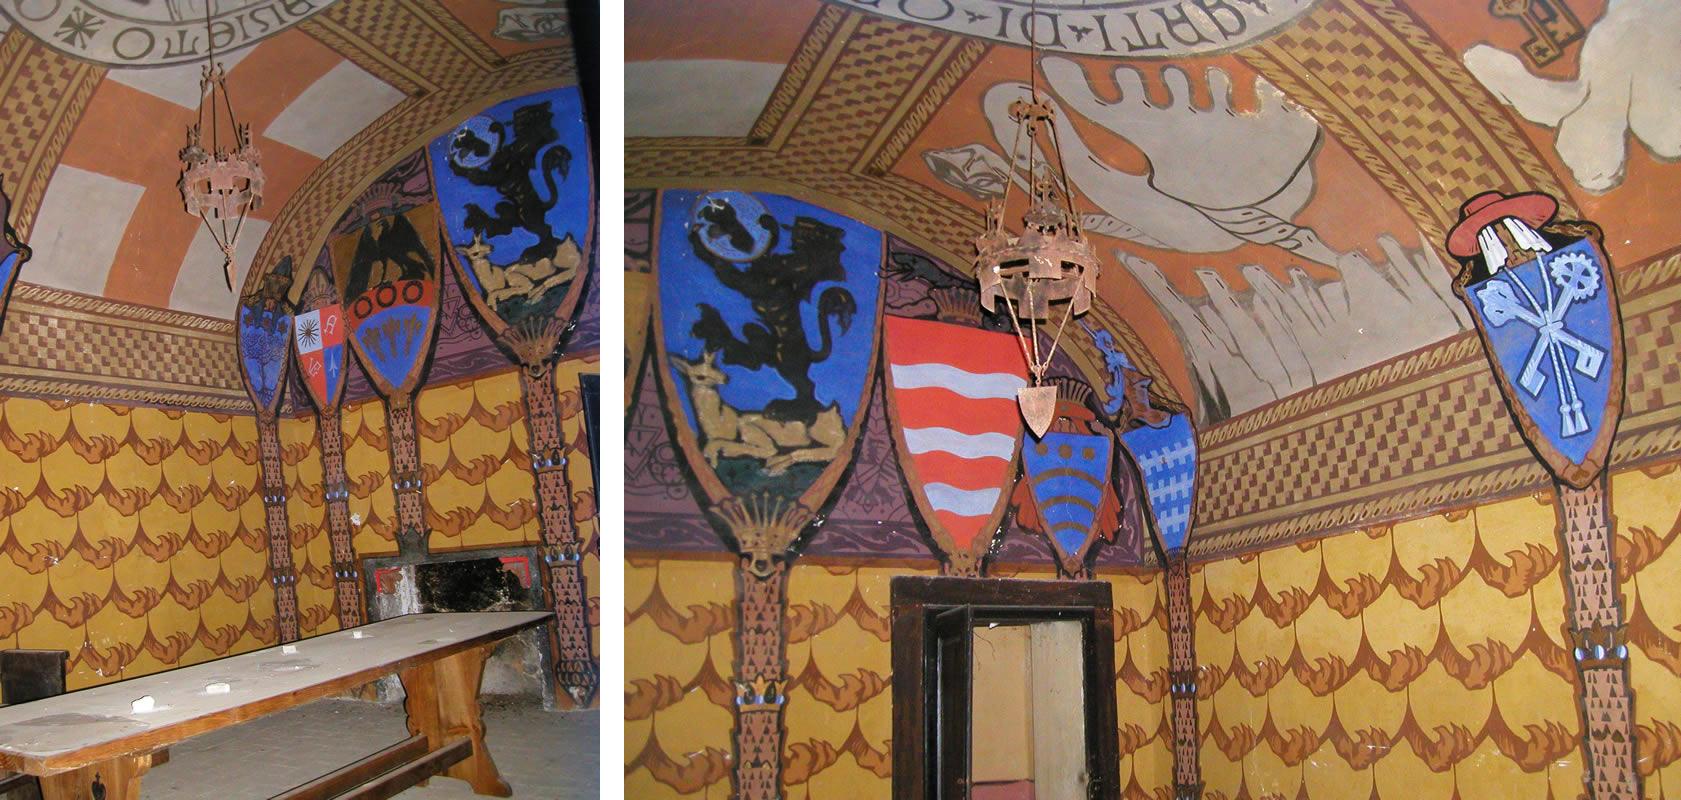 ISAO - dipinto al soffitto